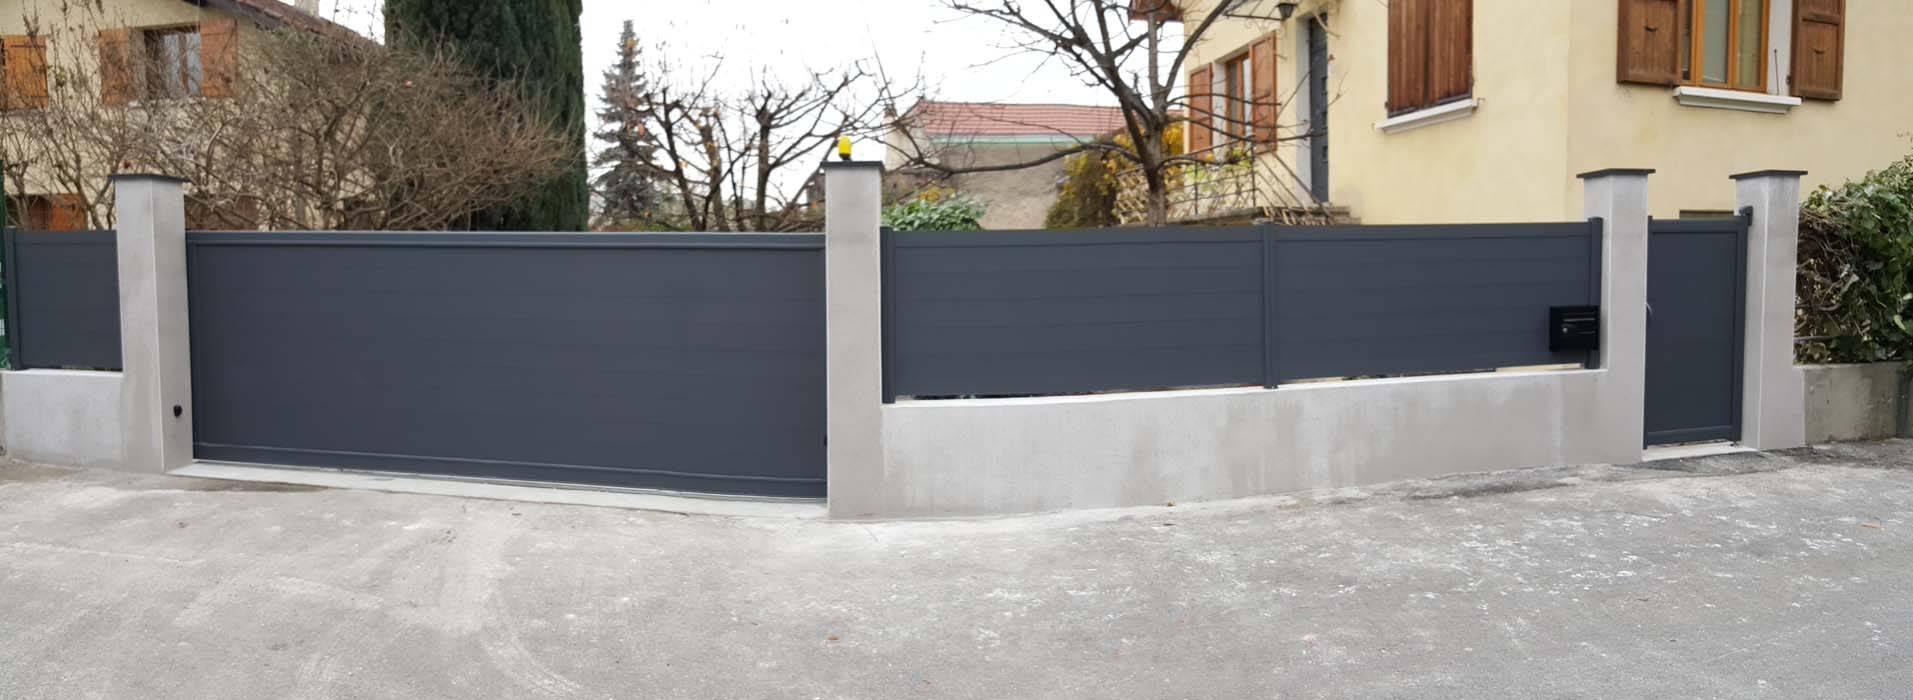 portail aluminium coulissant grenoble alproconcept fabrication et pose alproconcept. Black Bedroom Furniture Sets. Home Design Ideas